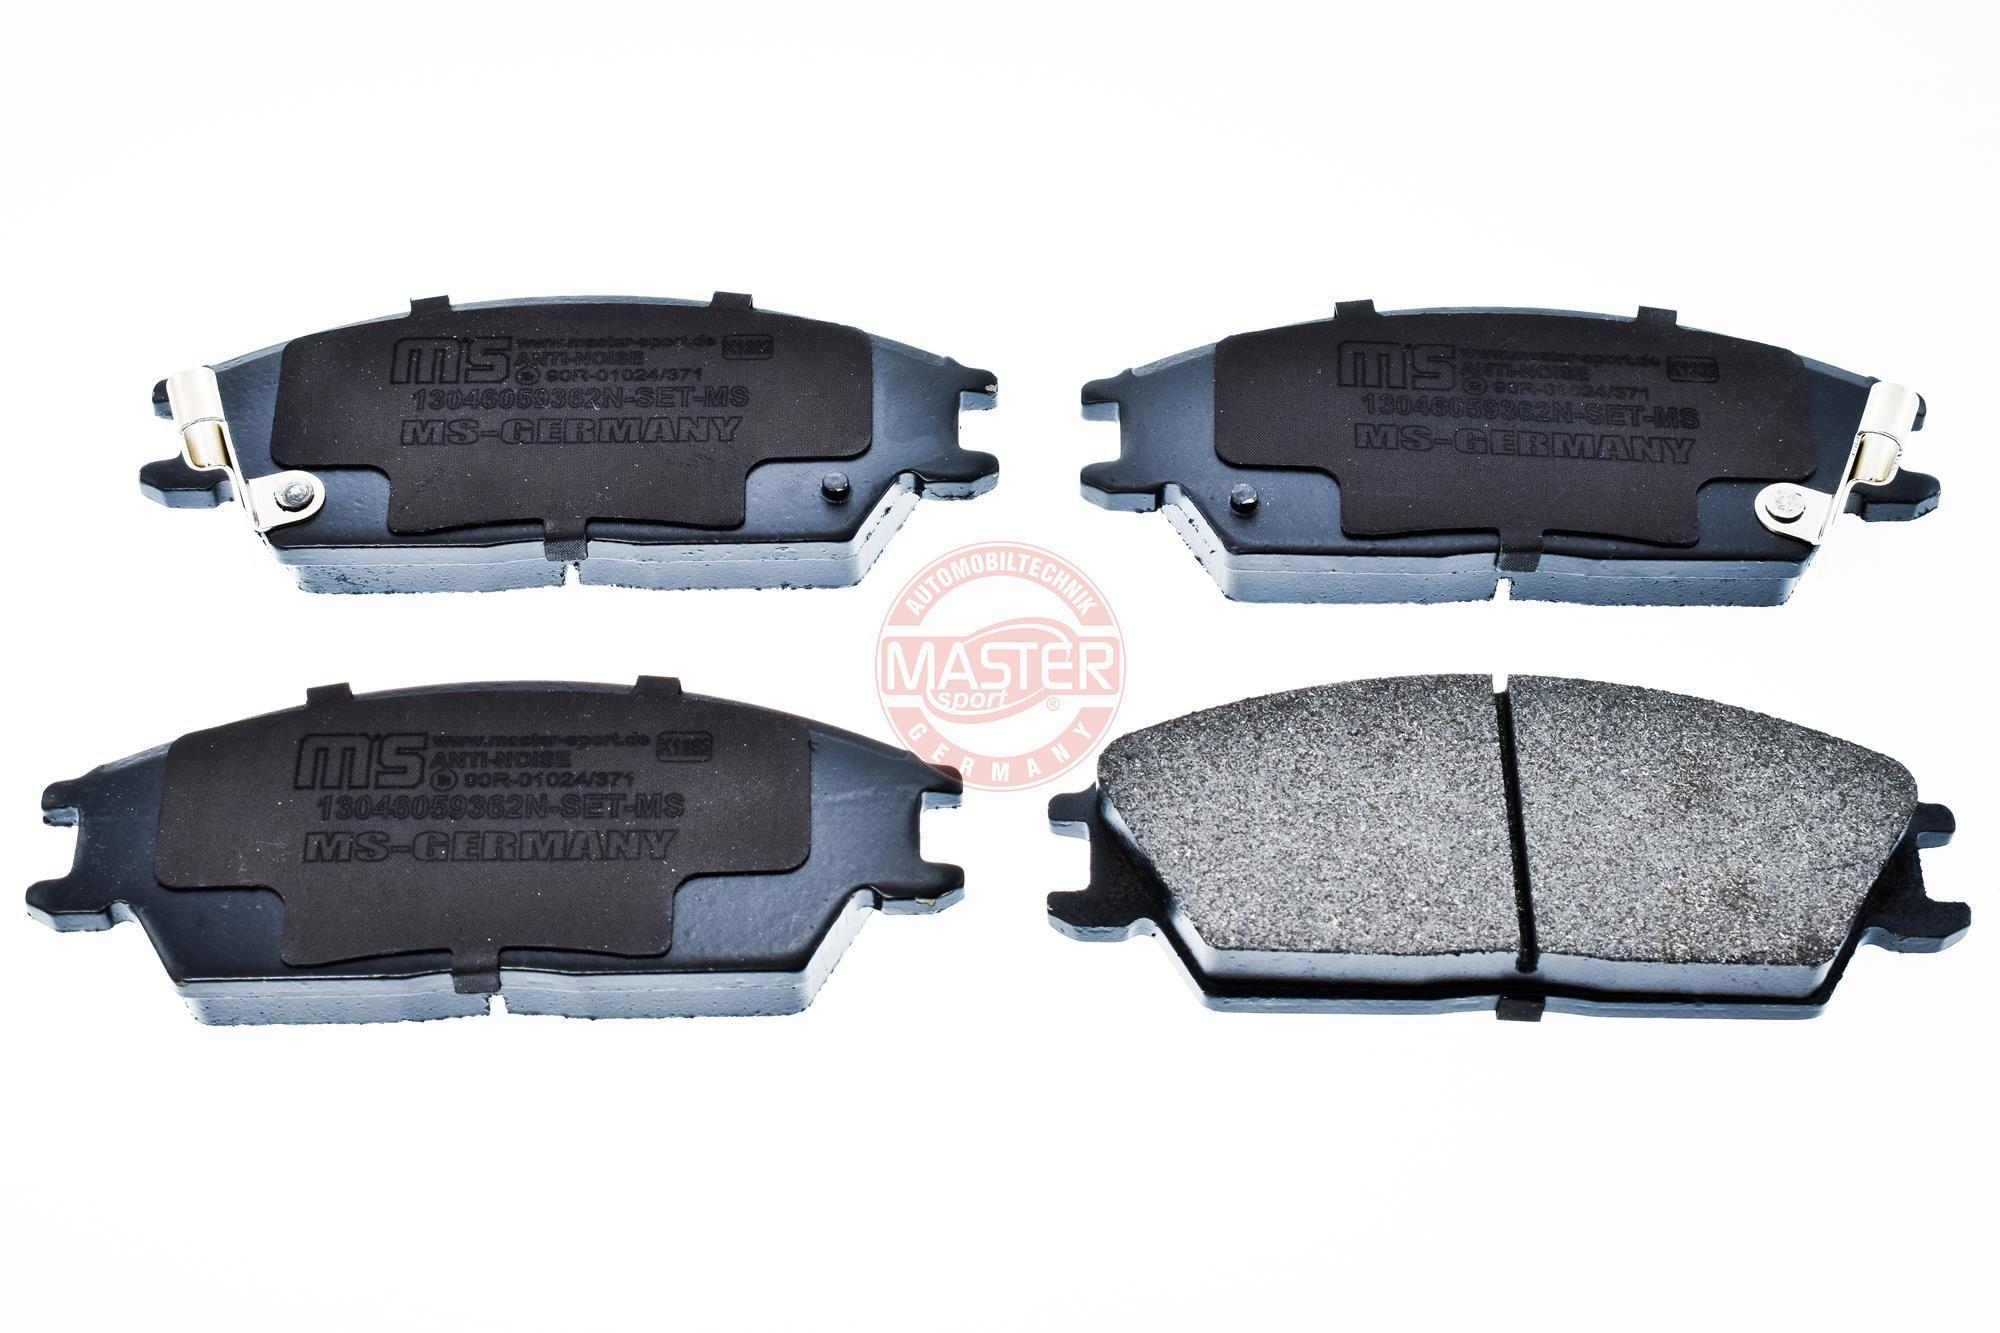 Bremsbeläge 13046059362N-SET-MS MASTER-SPORT 236059362 in Original Qualität